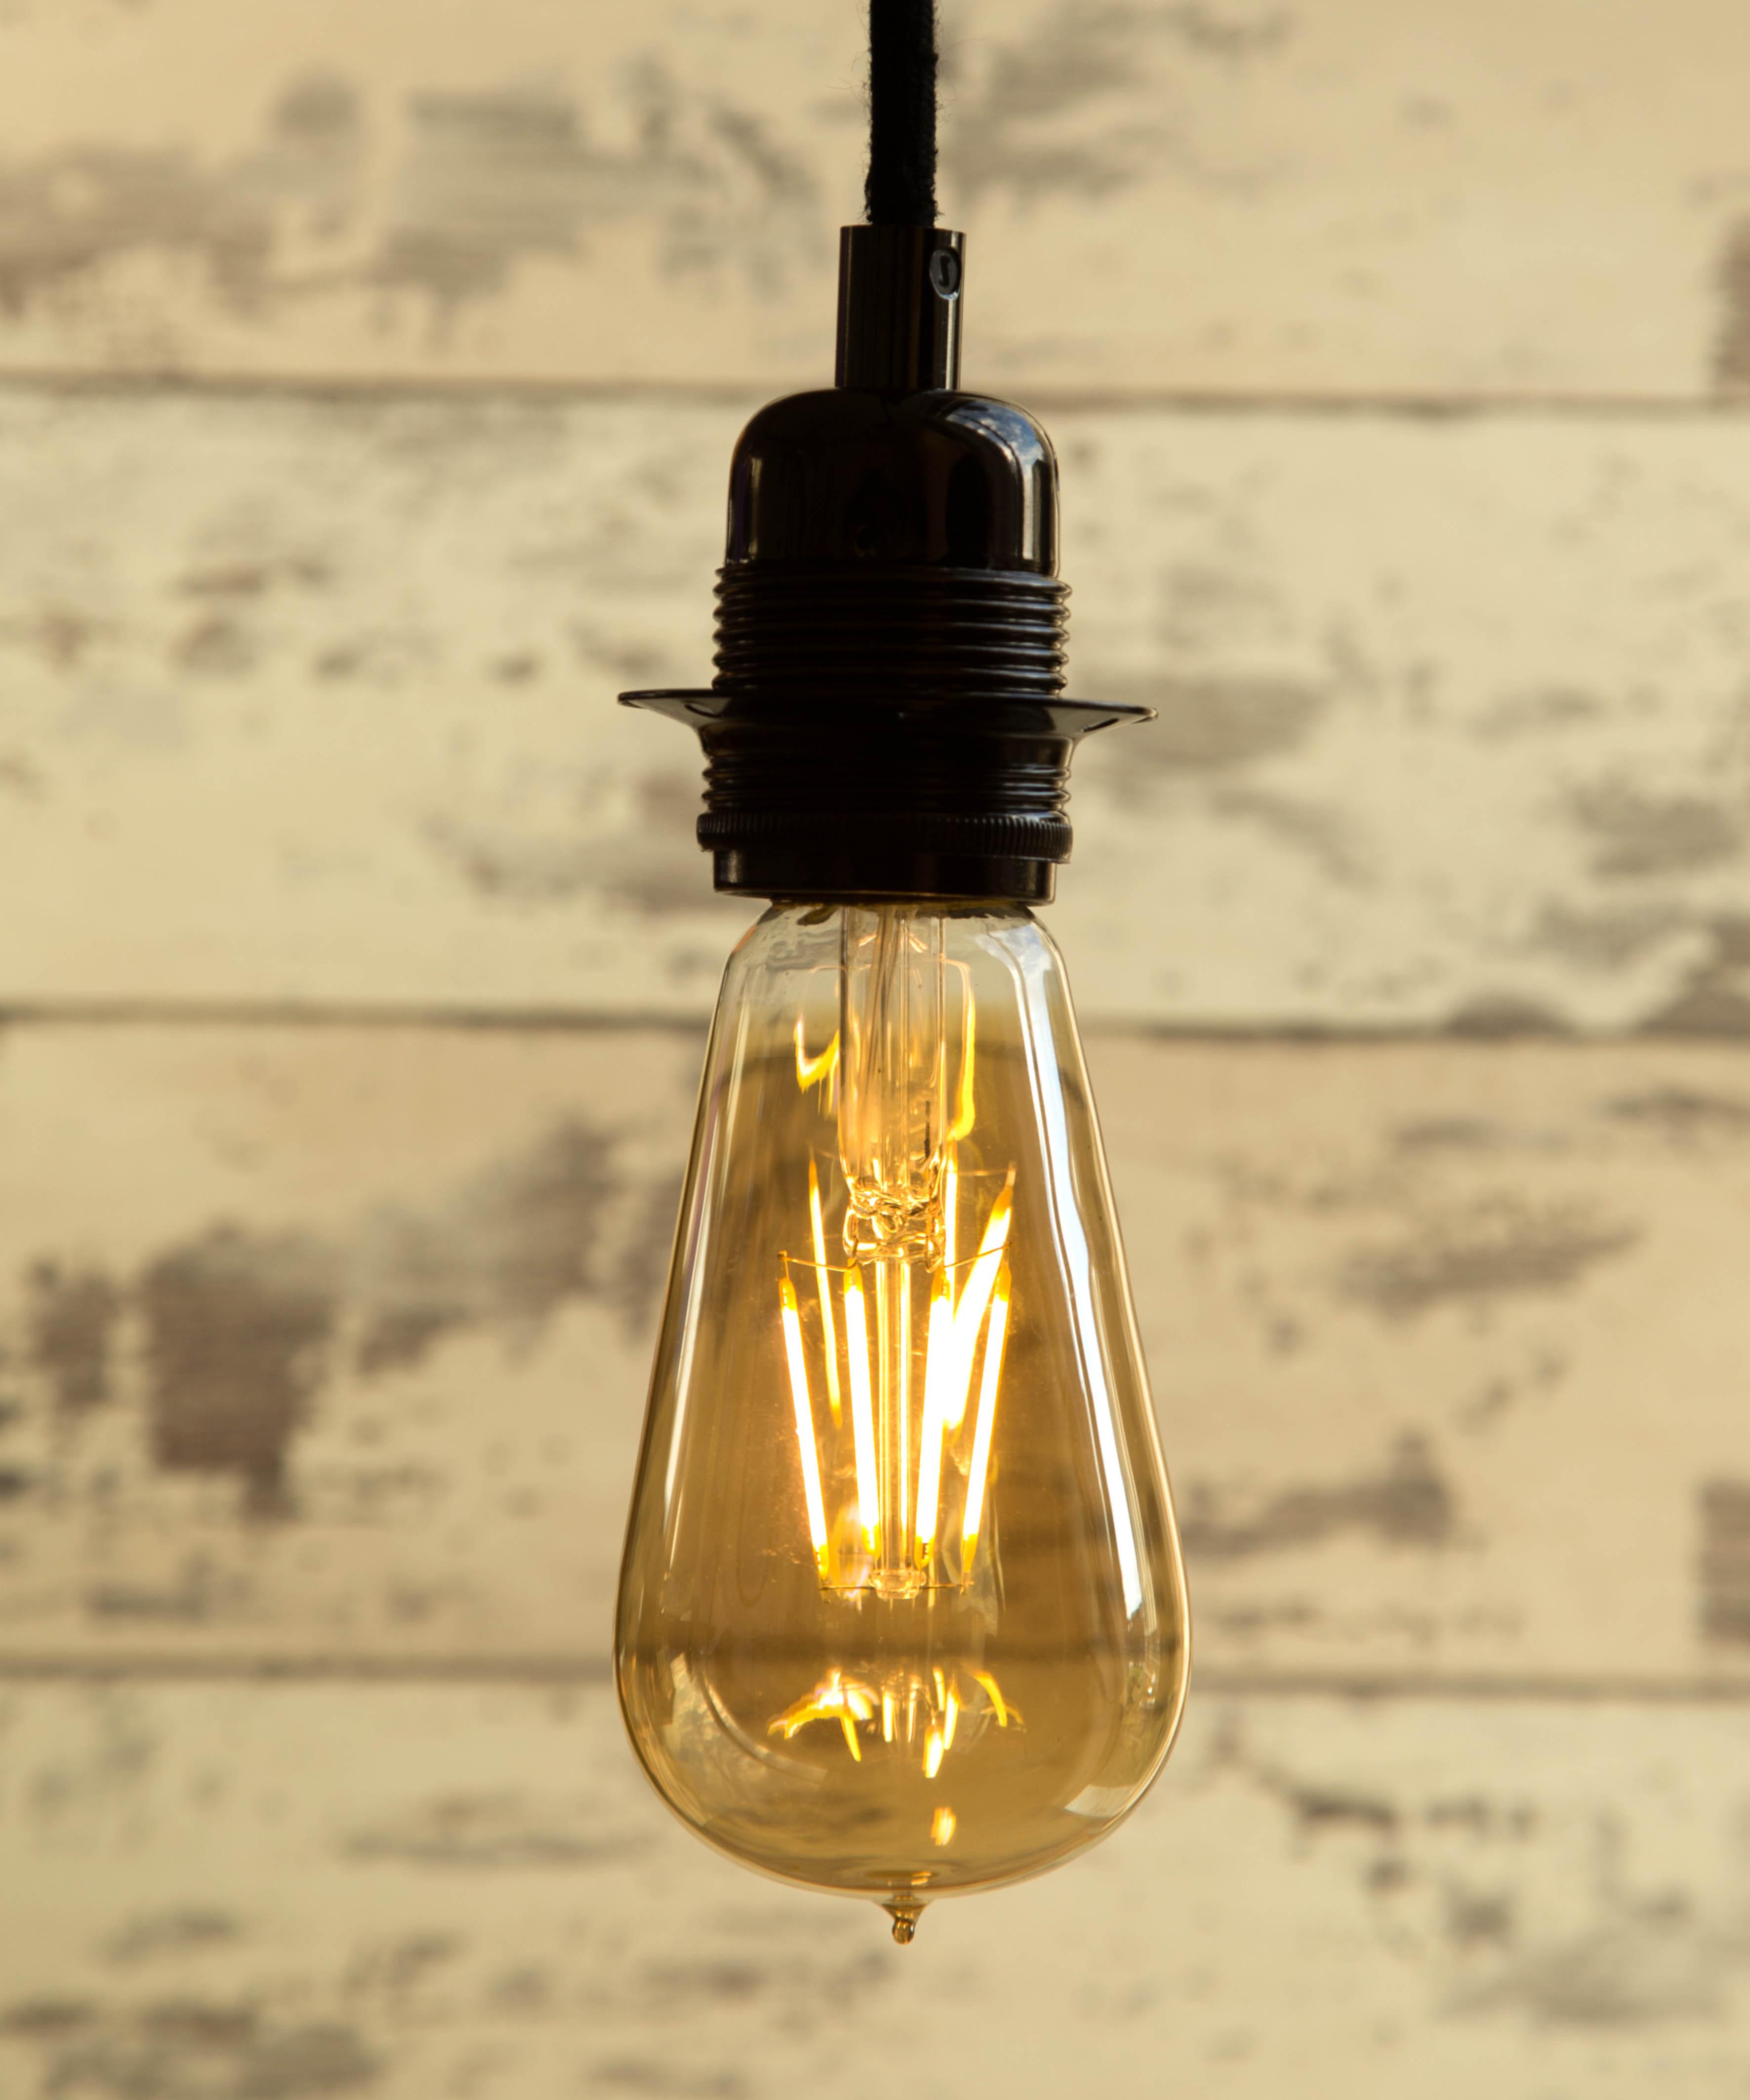 Teardrop st64 william and watson vintage edison bulb industrial light - Teardrop Large 100percent Dimmable St64 4w Led William And Watson Industrial Vintage Grey Sg